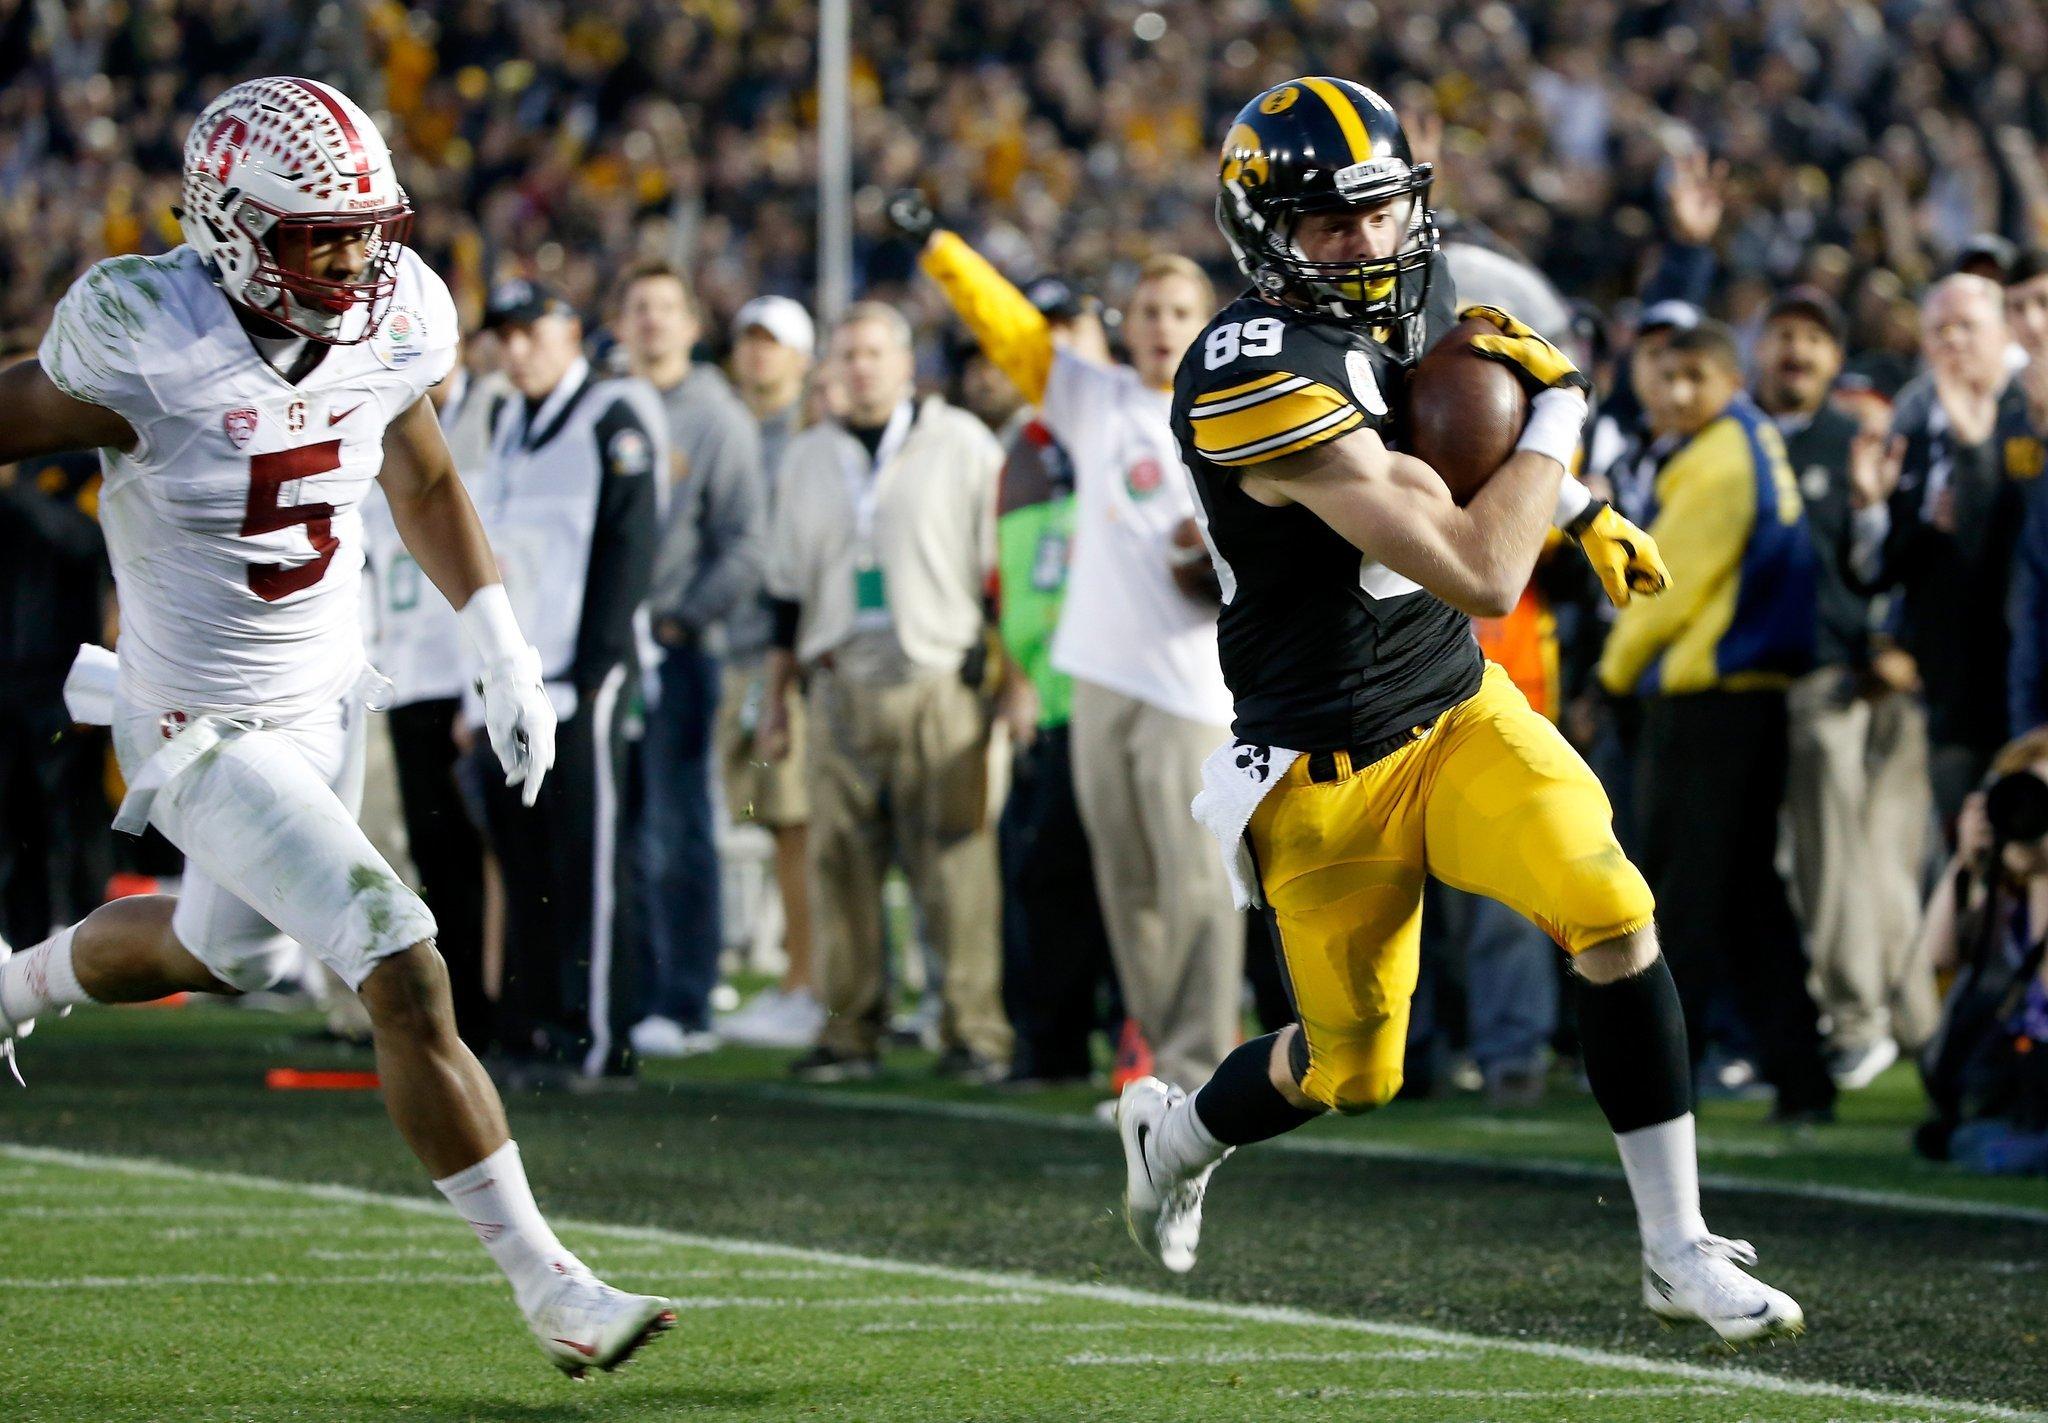 Matt VandeBerg runs into the end zone. (Sean M. Haffey / Getty Images)